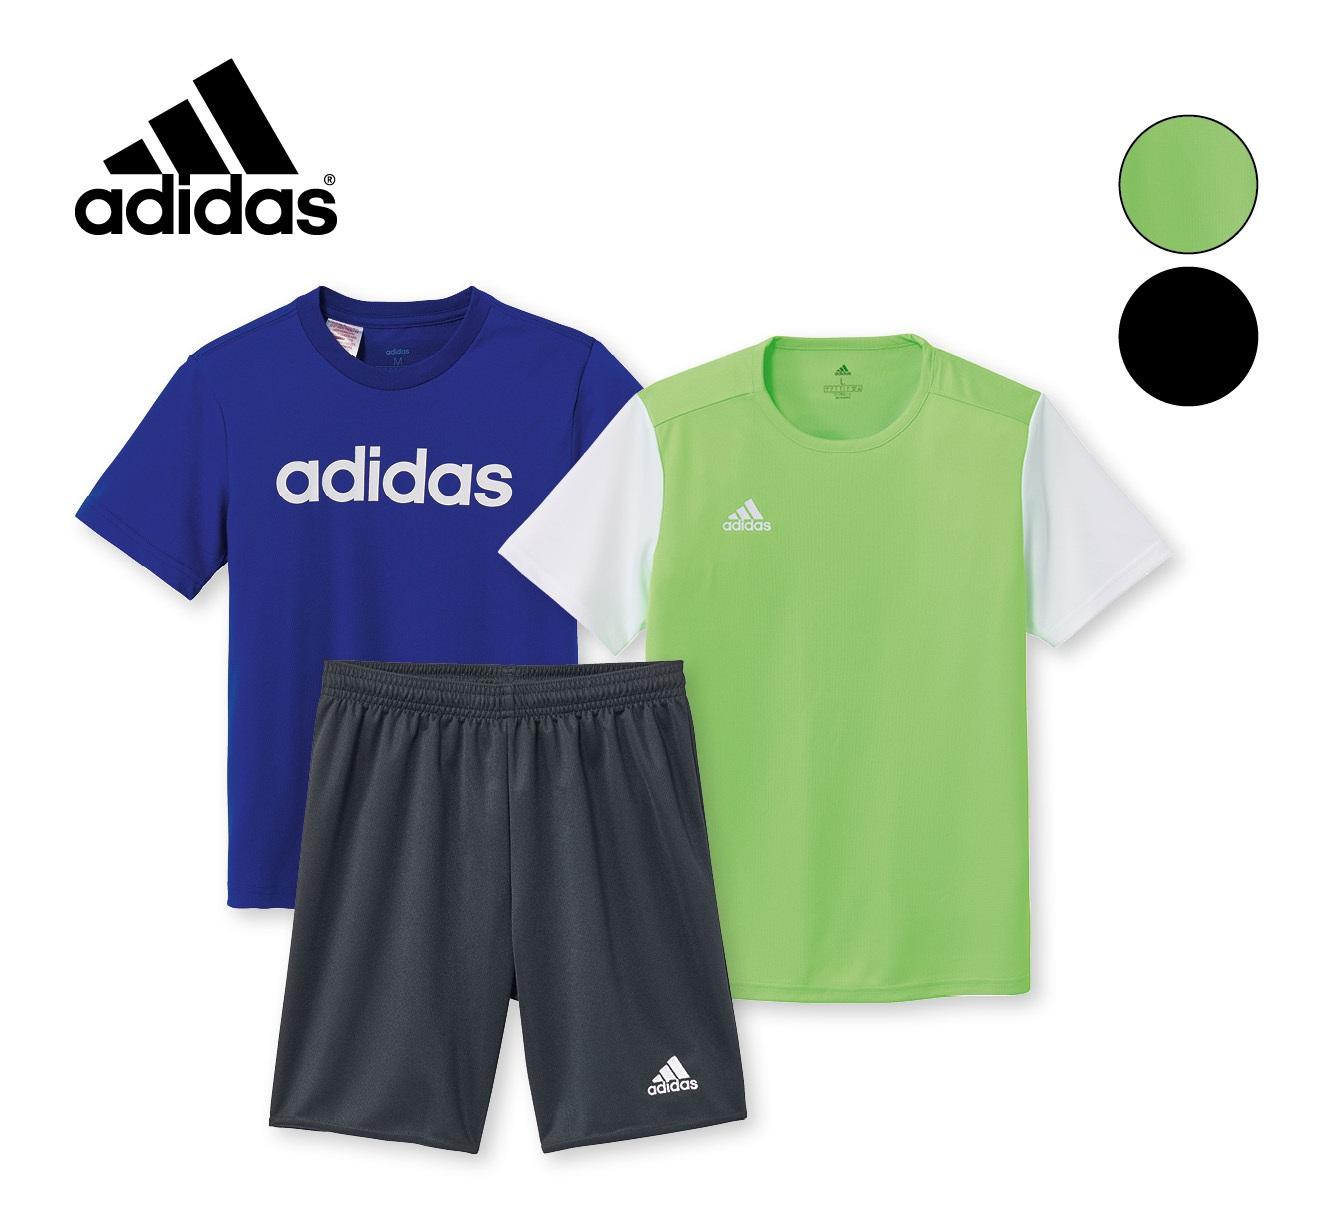 Kinder/Herren T-Shirt oder Herren Shorts